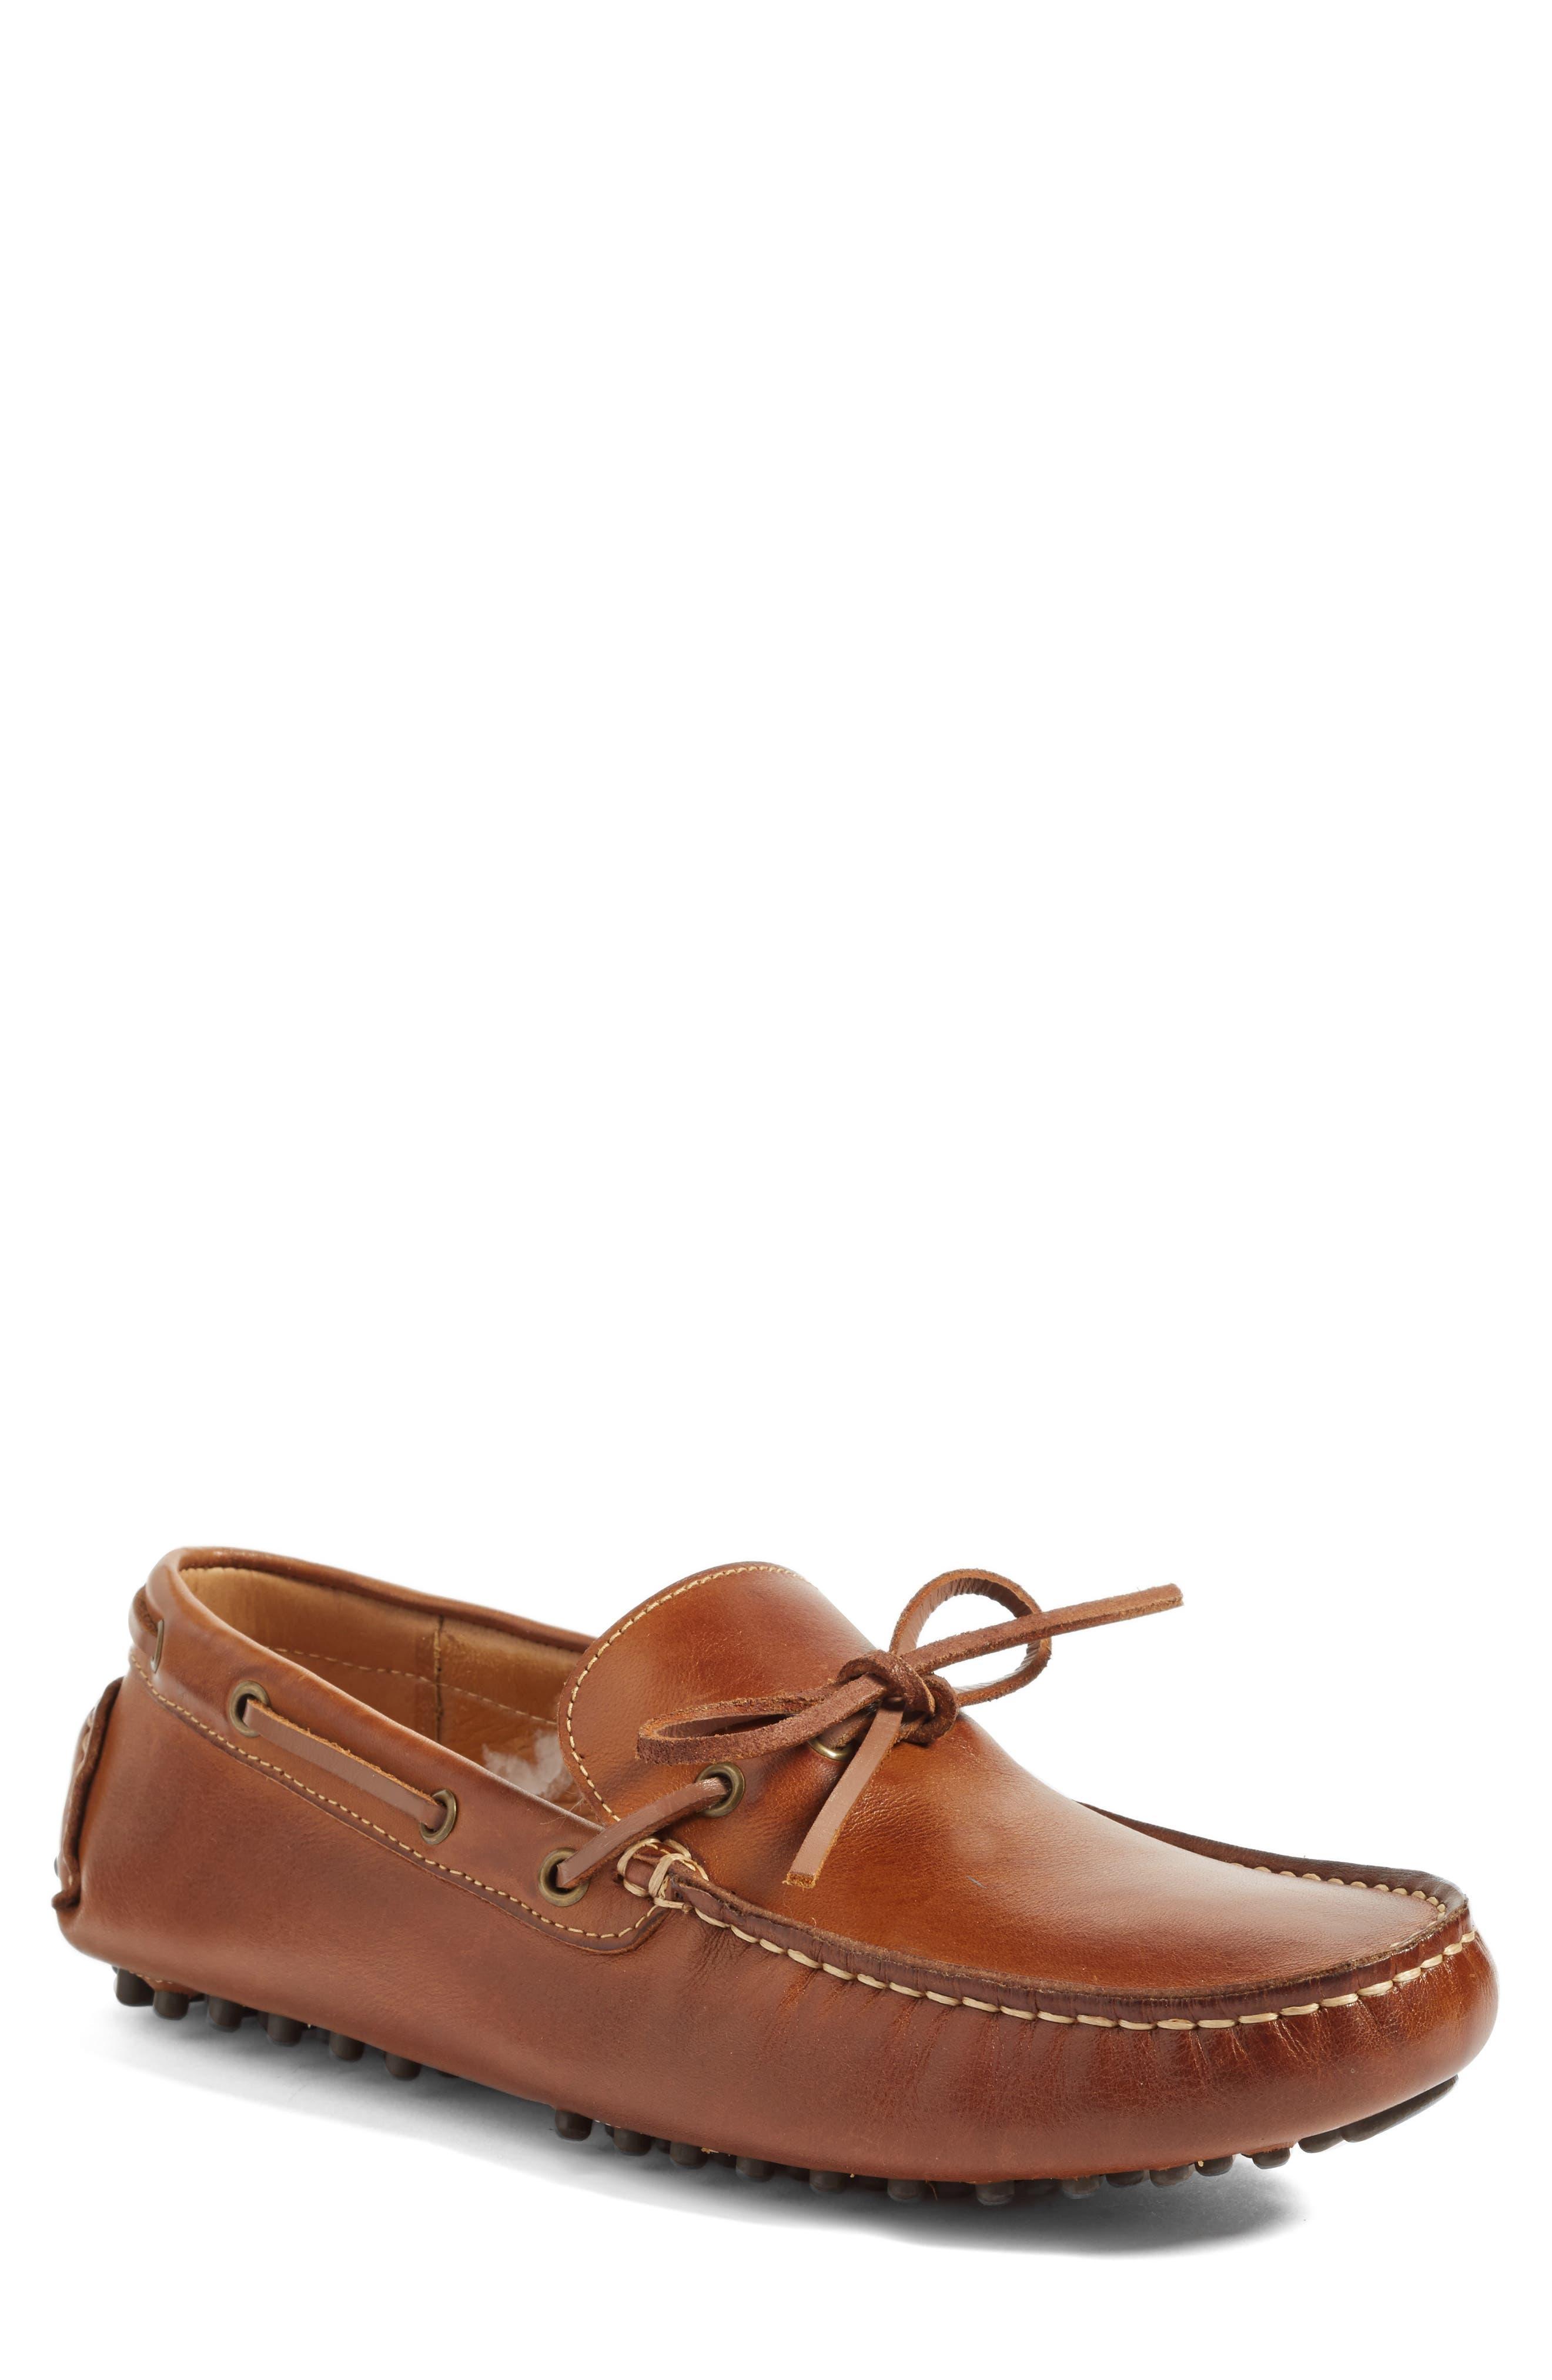 Alternate Image 3  - John W. Nordstrom® Midland Driving Shoe (Men)